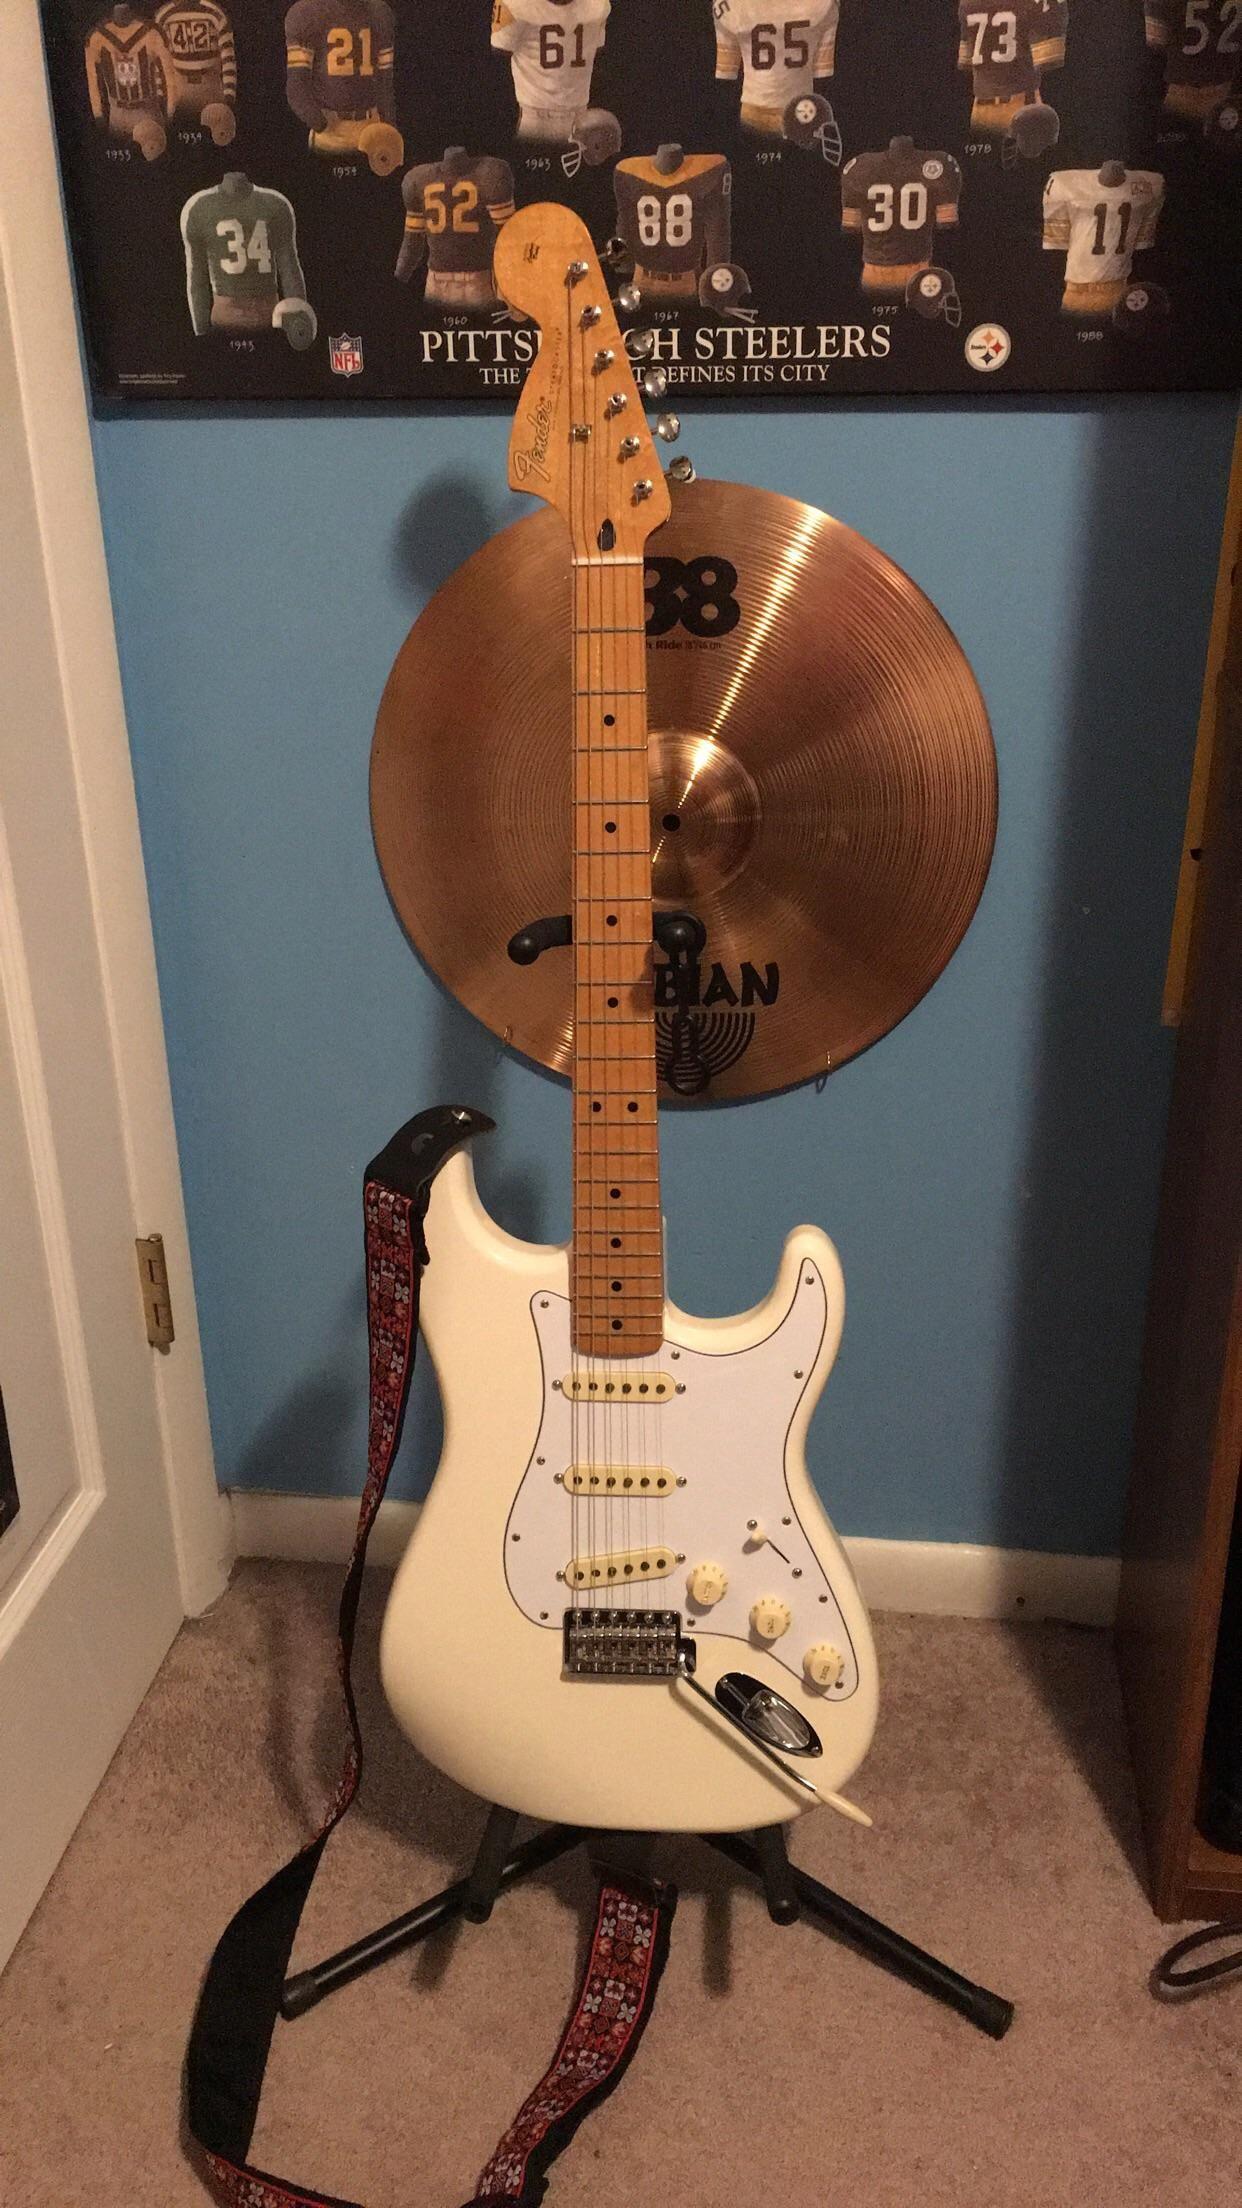 Ngd Fender Jimi Hendrix Signature Stratocaster In Olympic White Im In Love Guitar Electric Guitar Jimi Hendrix